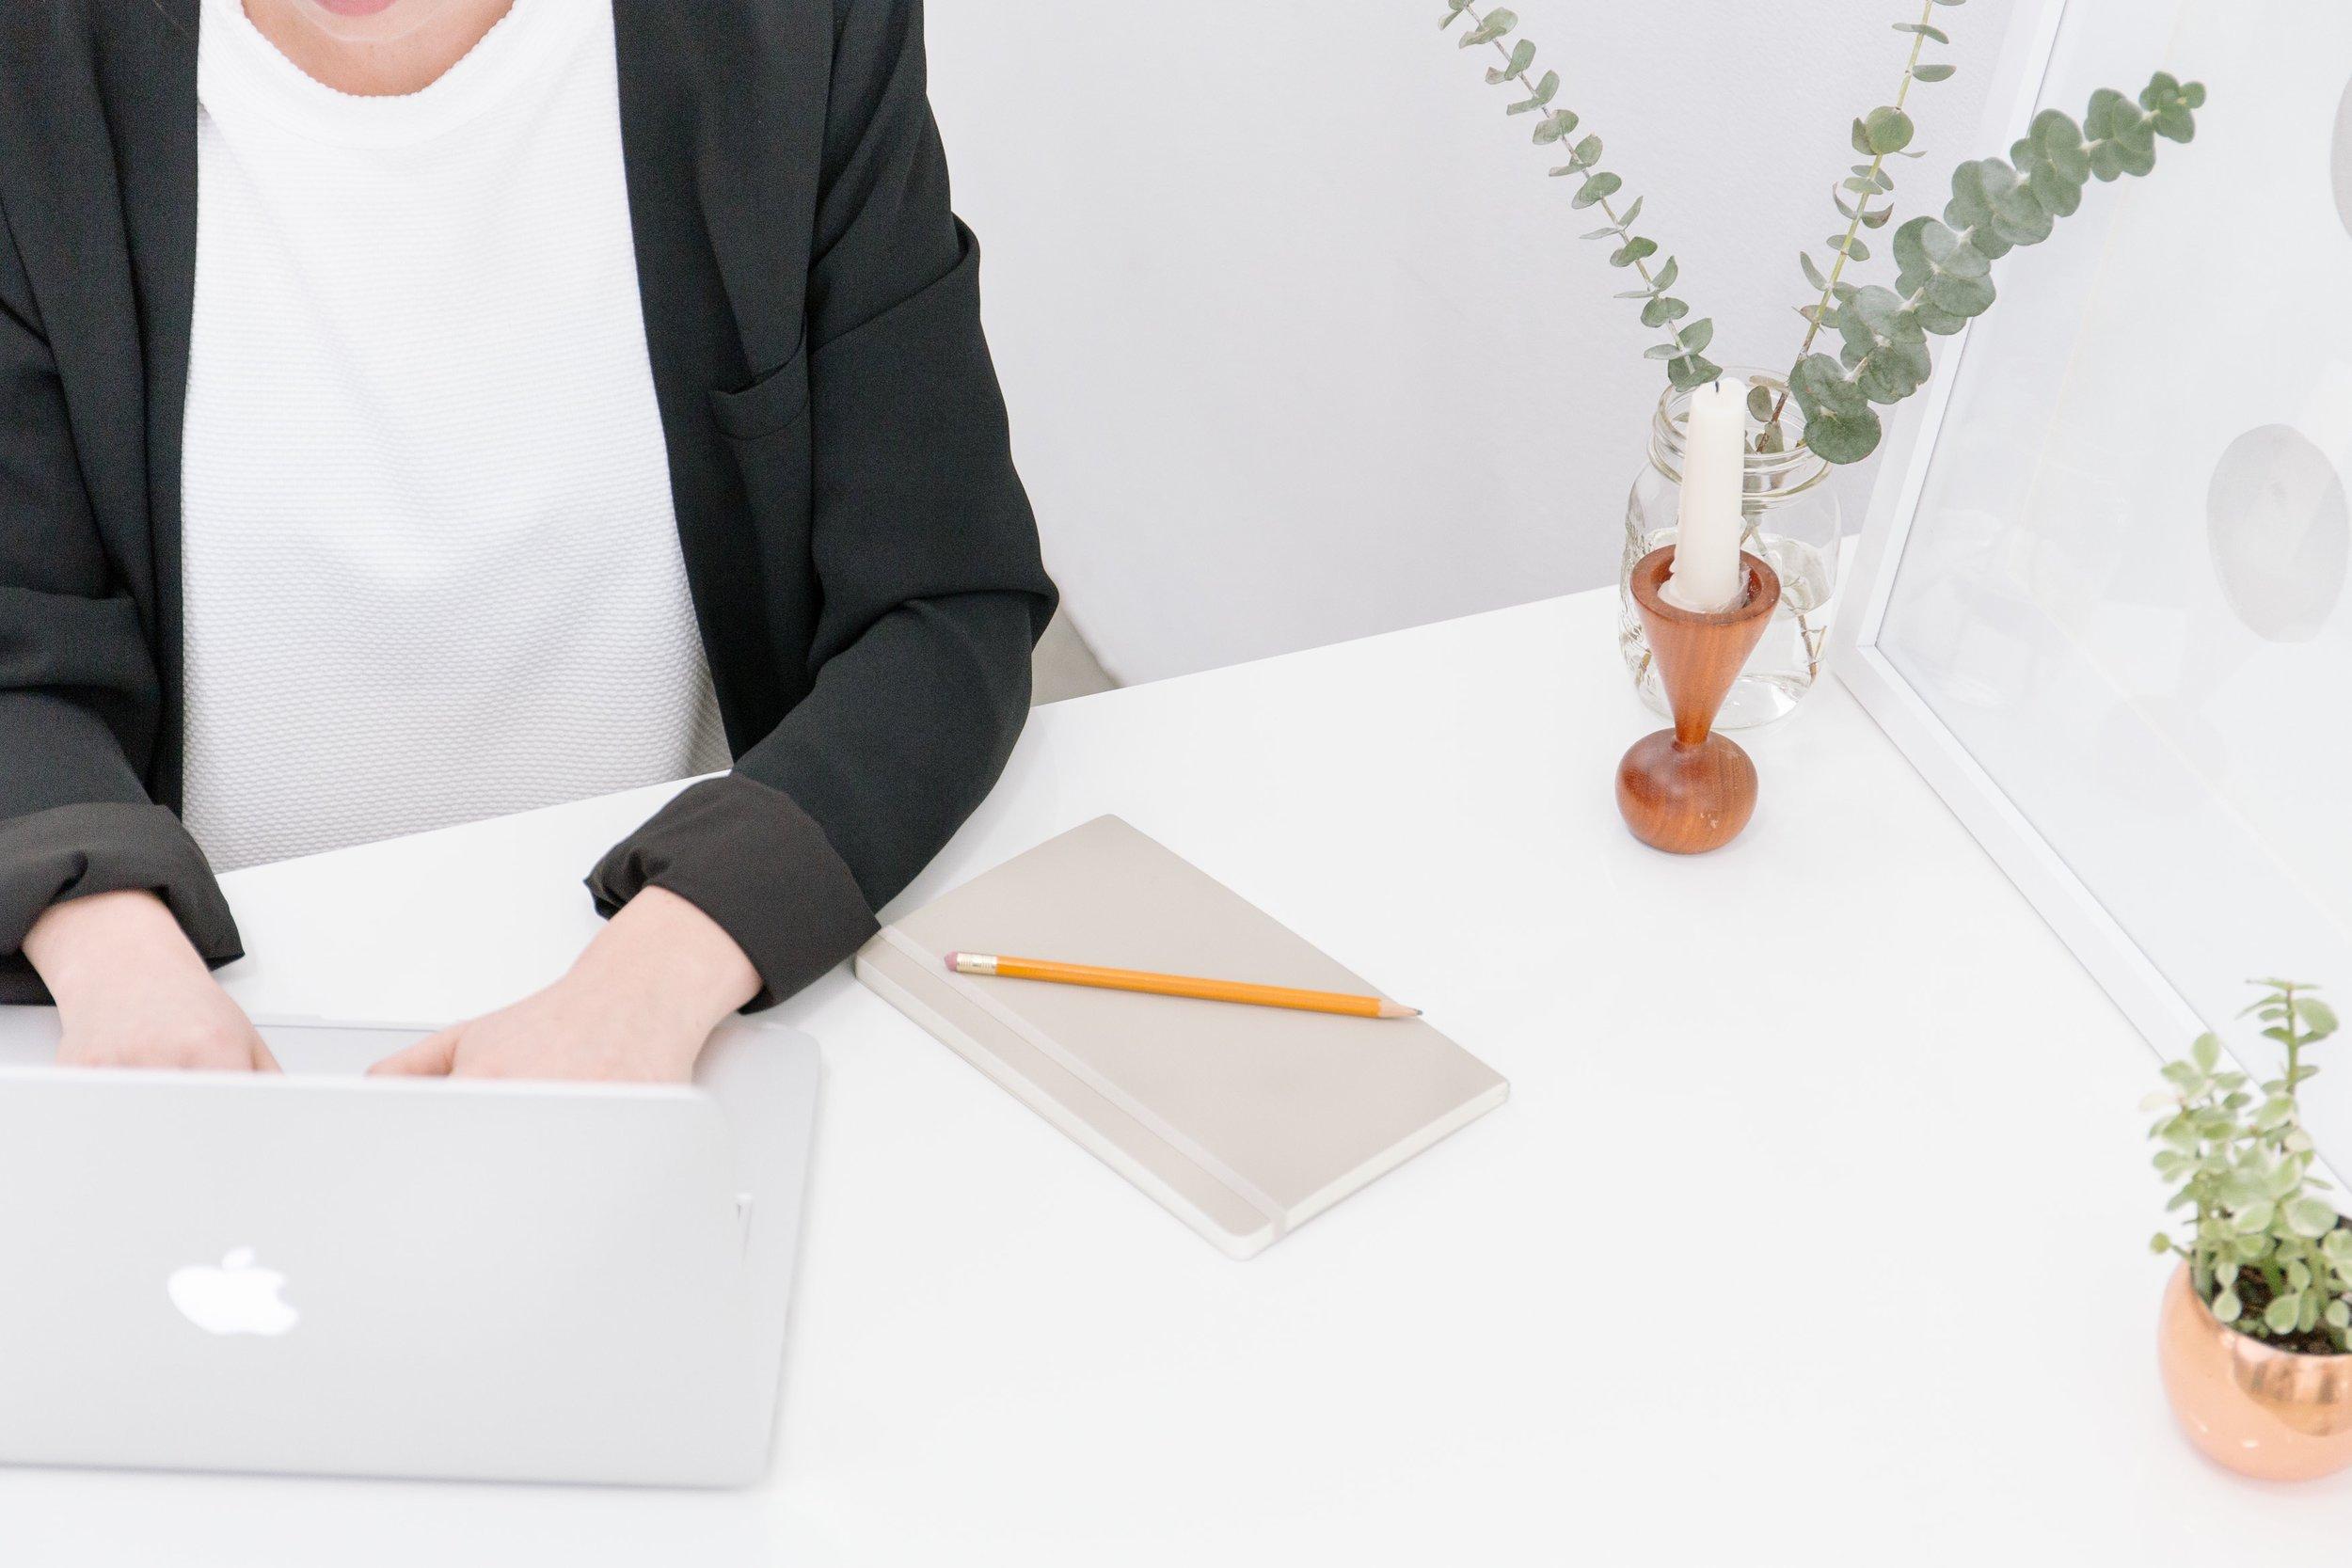 ziwuqmznrvs-bench-accounting.jpg